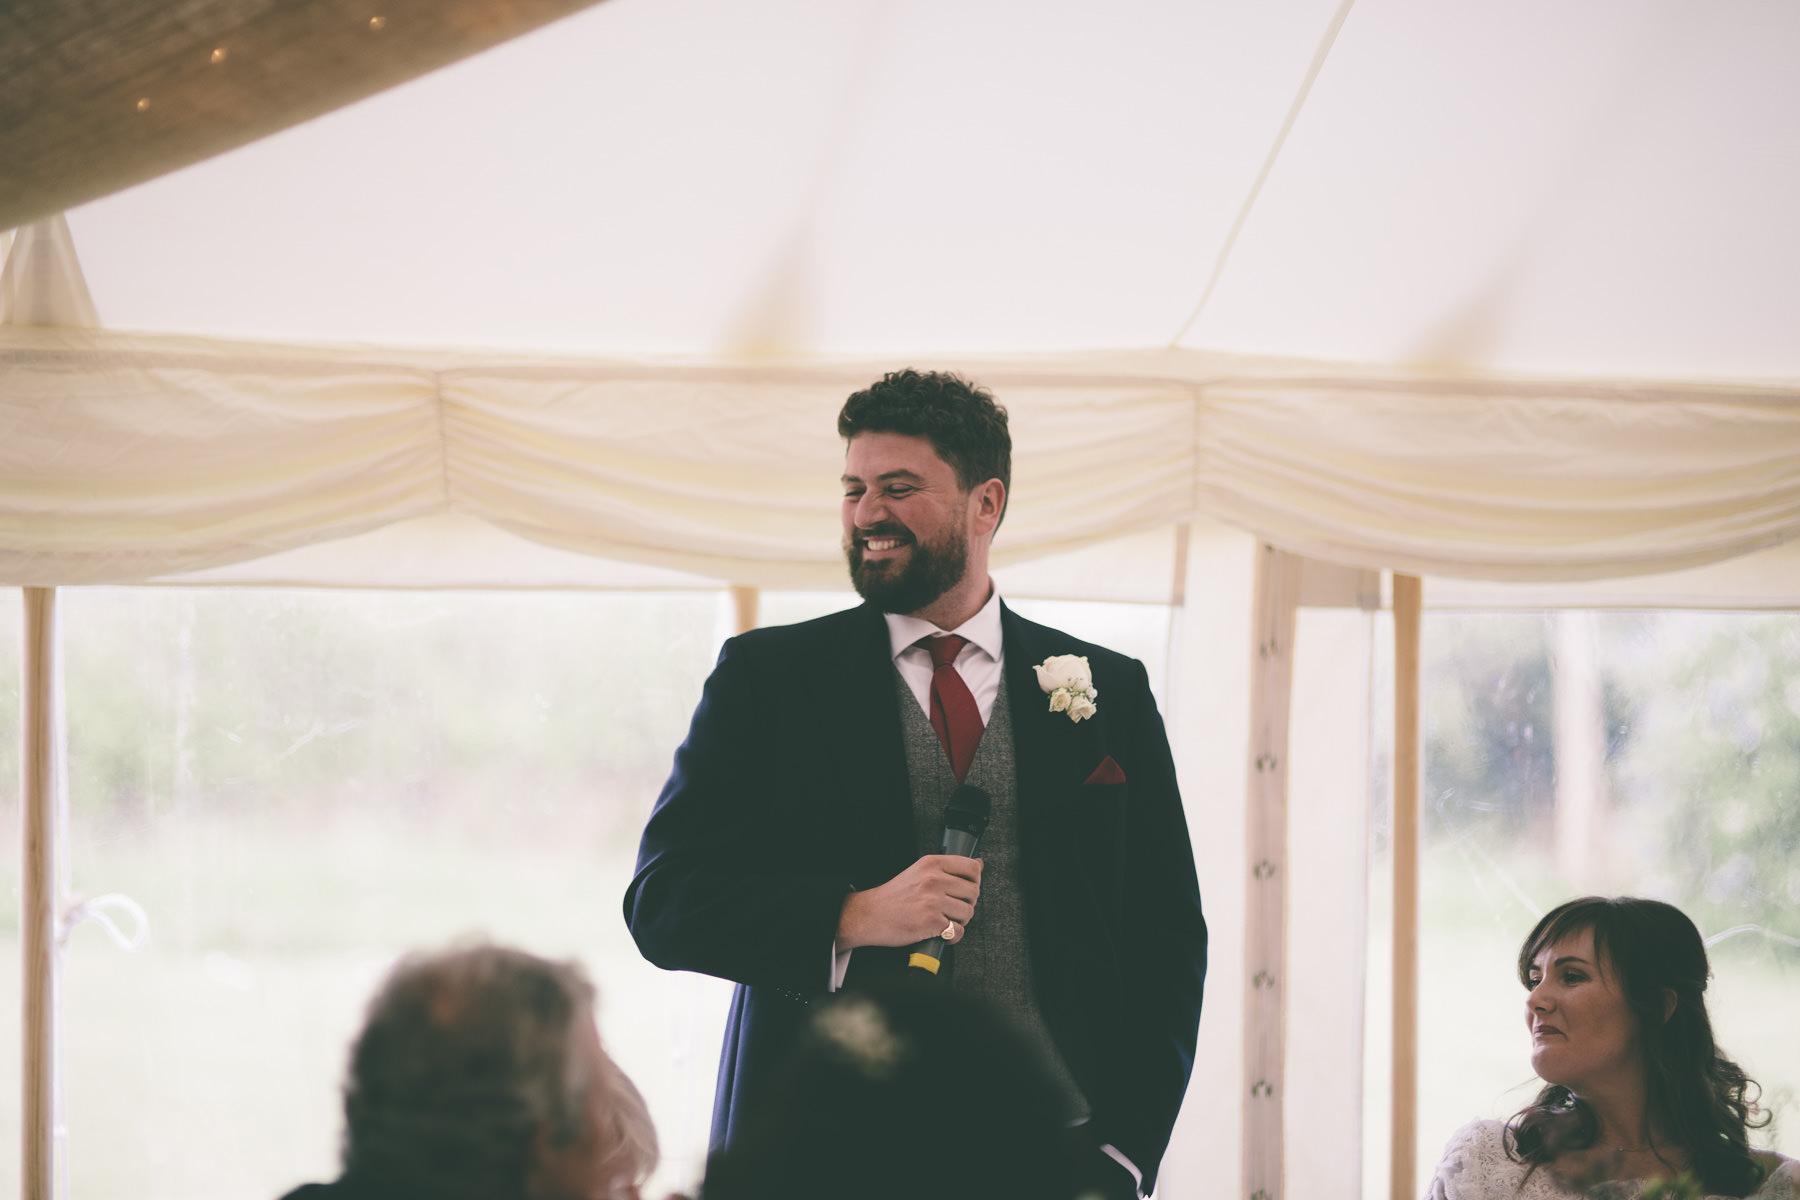 Pamber-Place-wedding-photography-basingstoke-hampshire-215